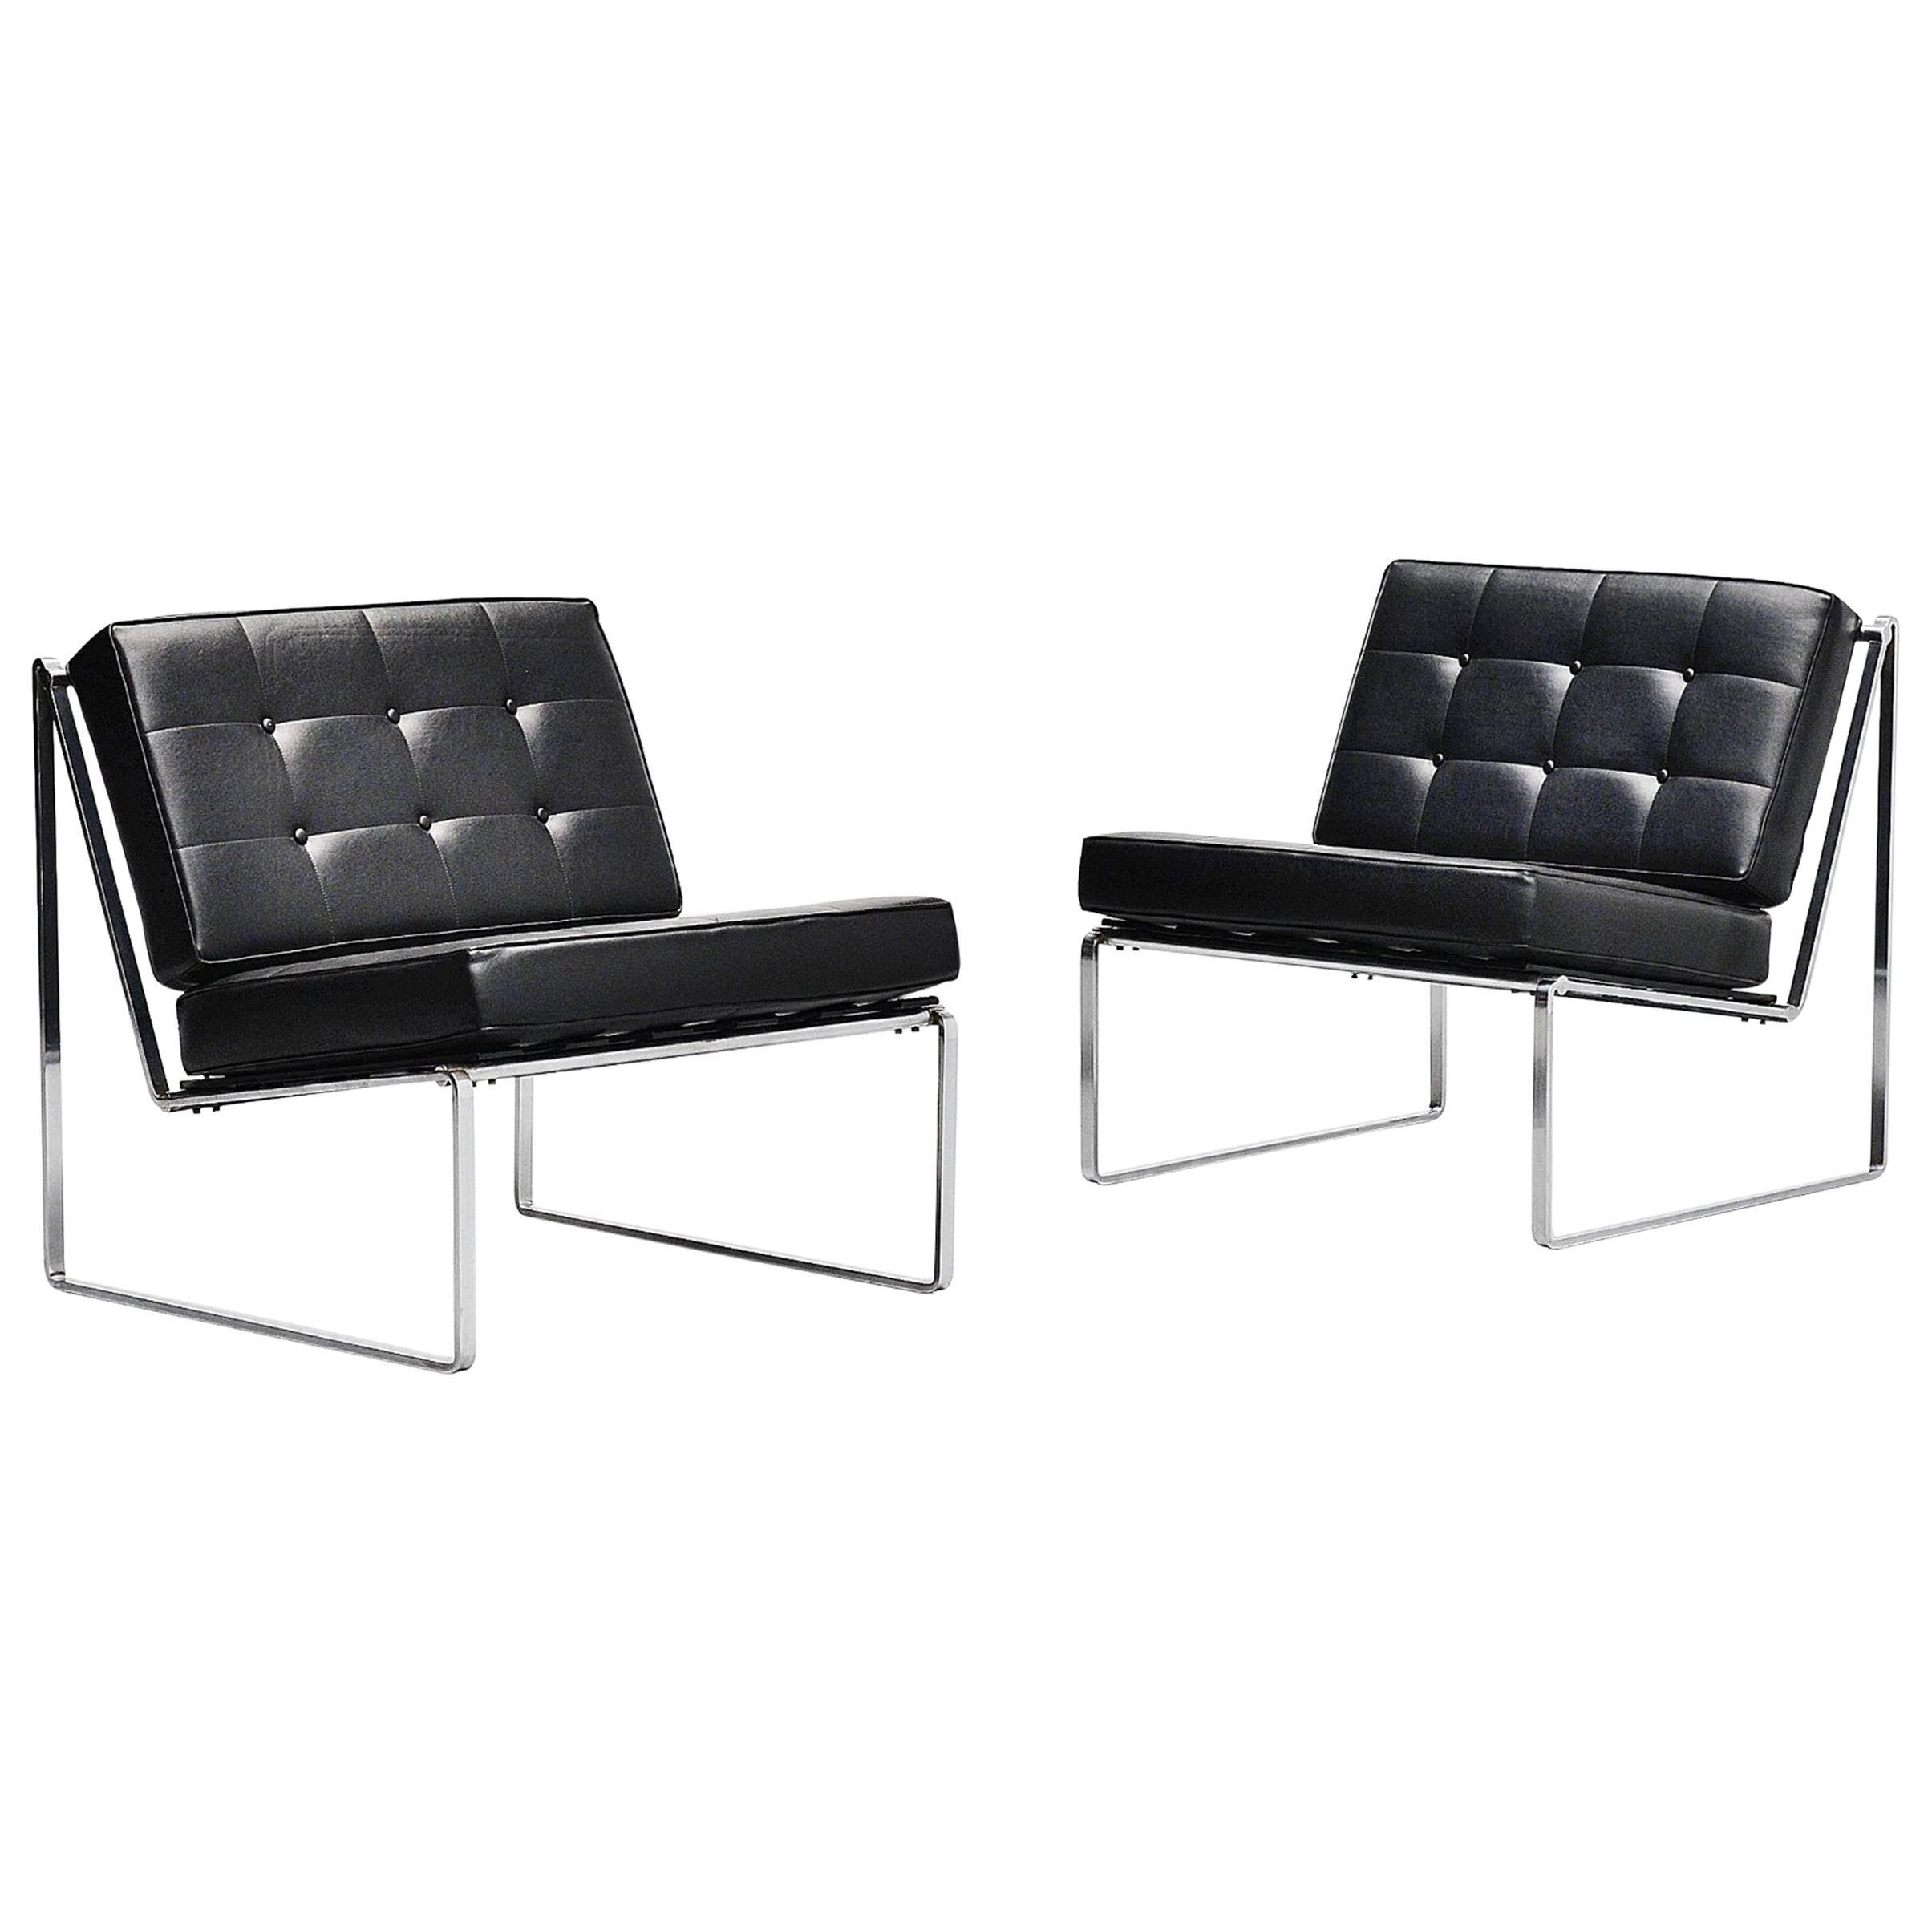 Kho Liang Ie 024 Lounge Chairs Artifort, 1962